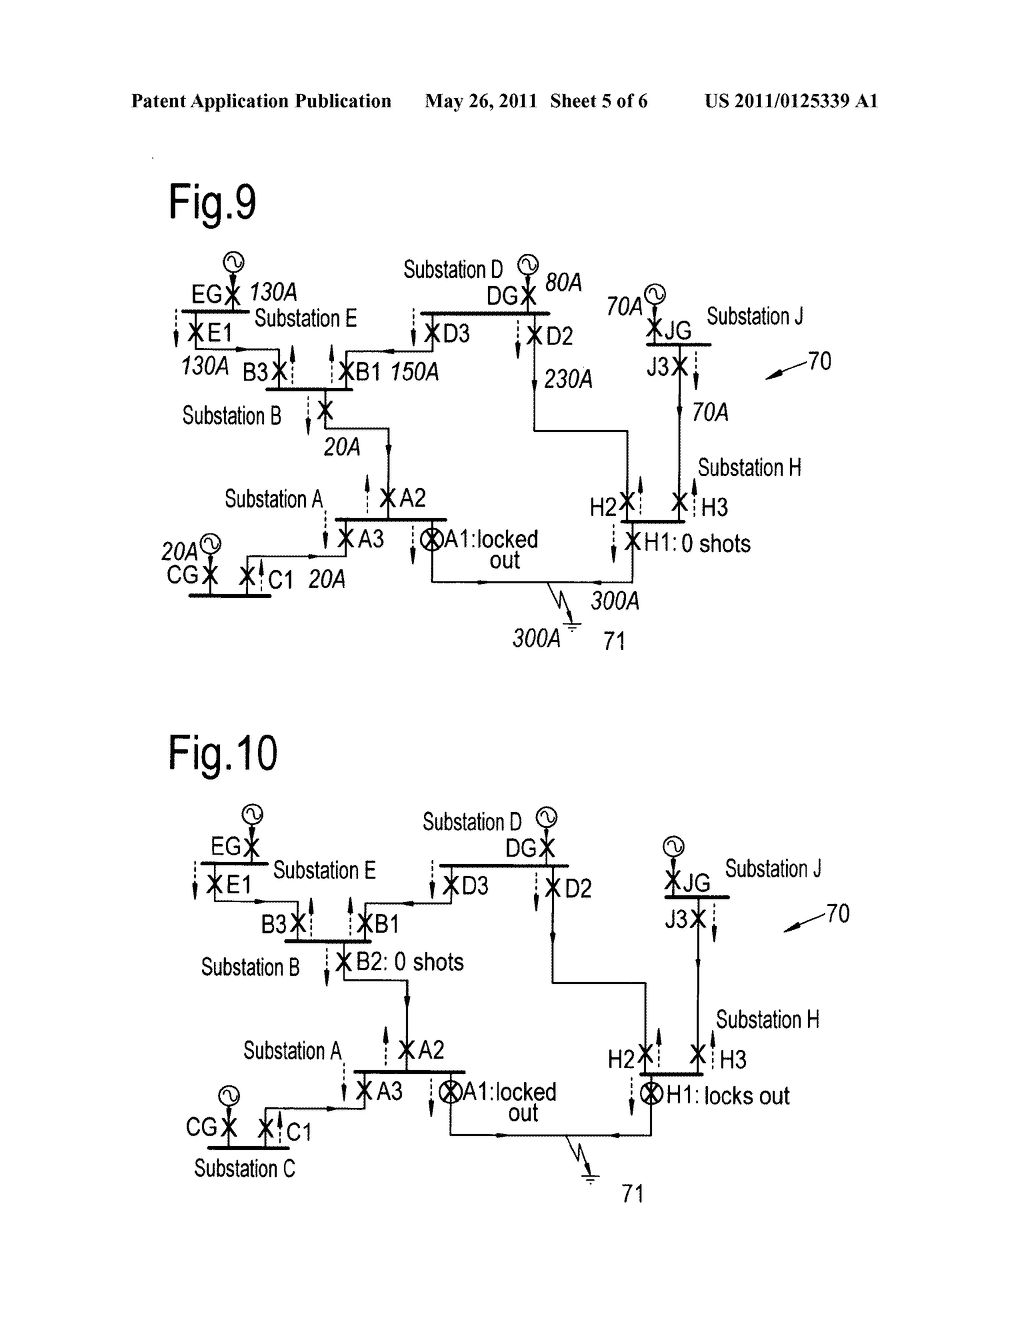 protection arrangement for an electrical power distribution network rh patentsencyclopedia com electricity network diagram electrical network diagram symbols